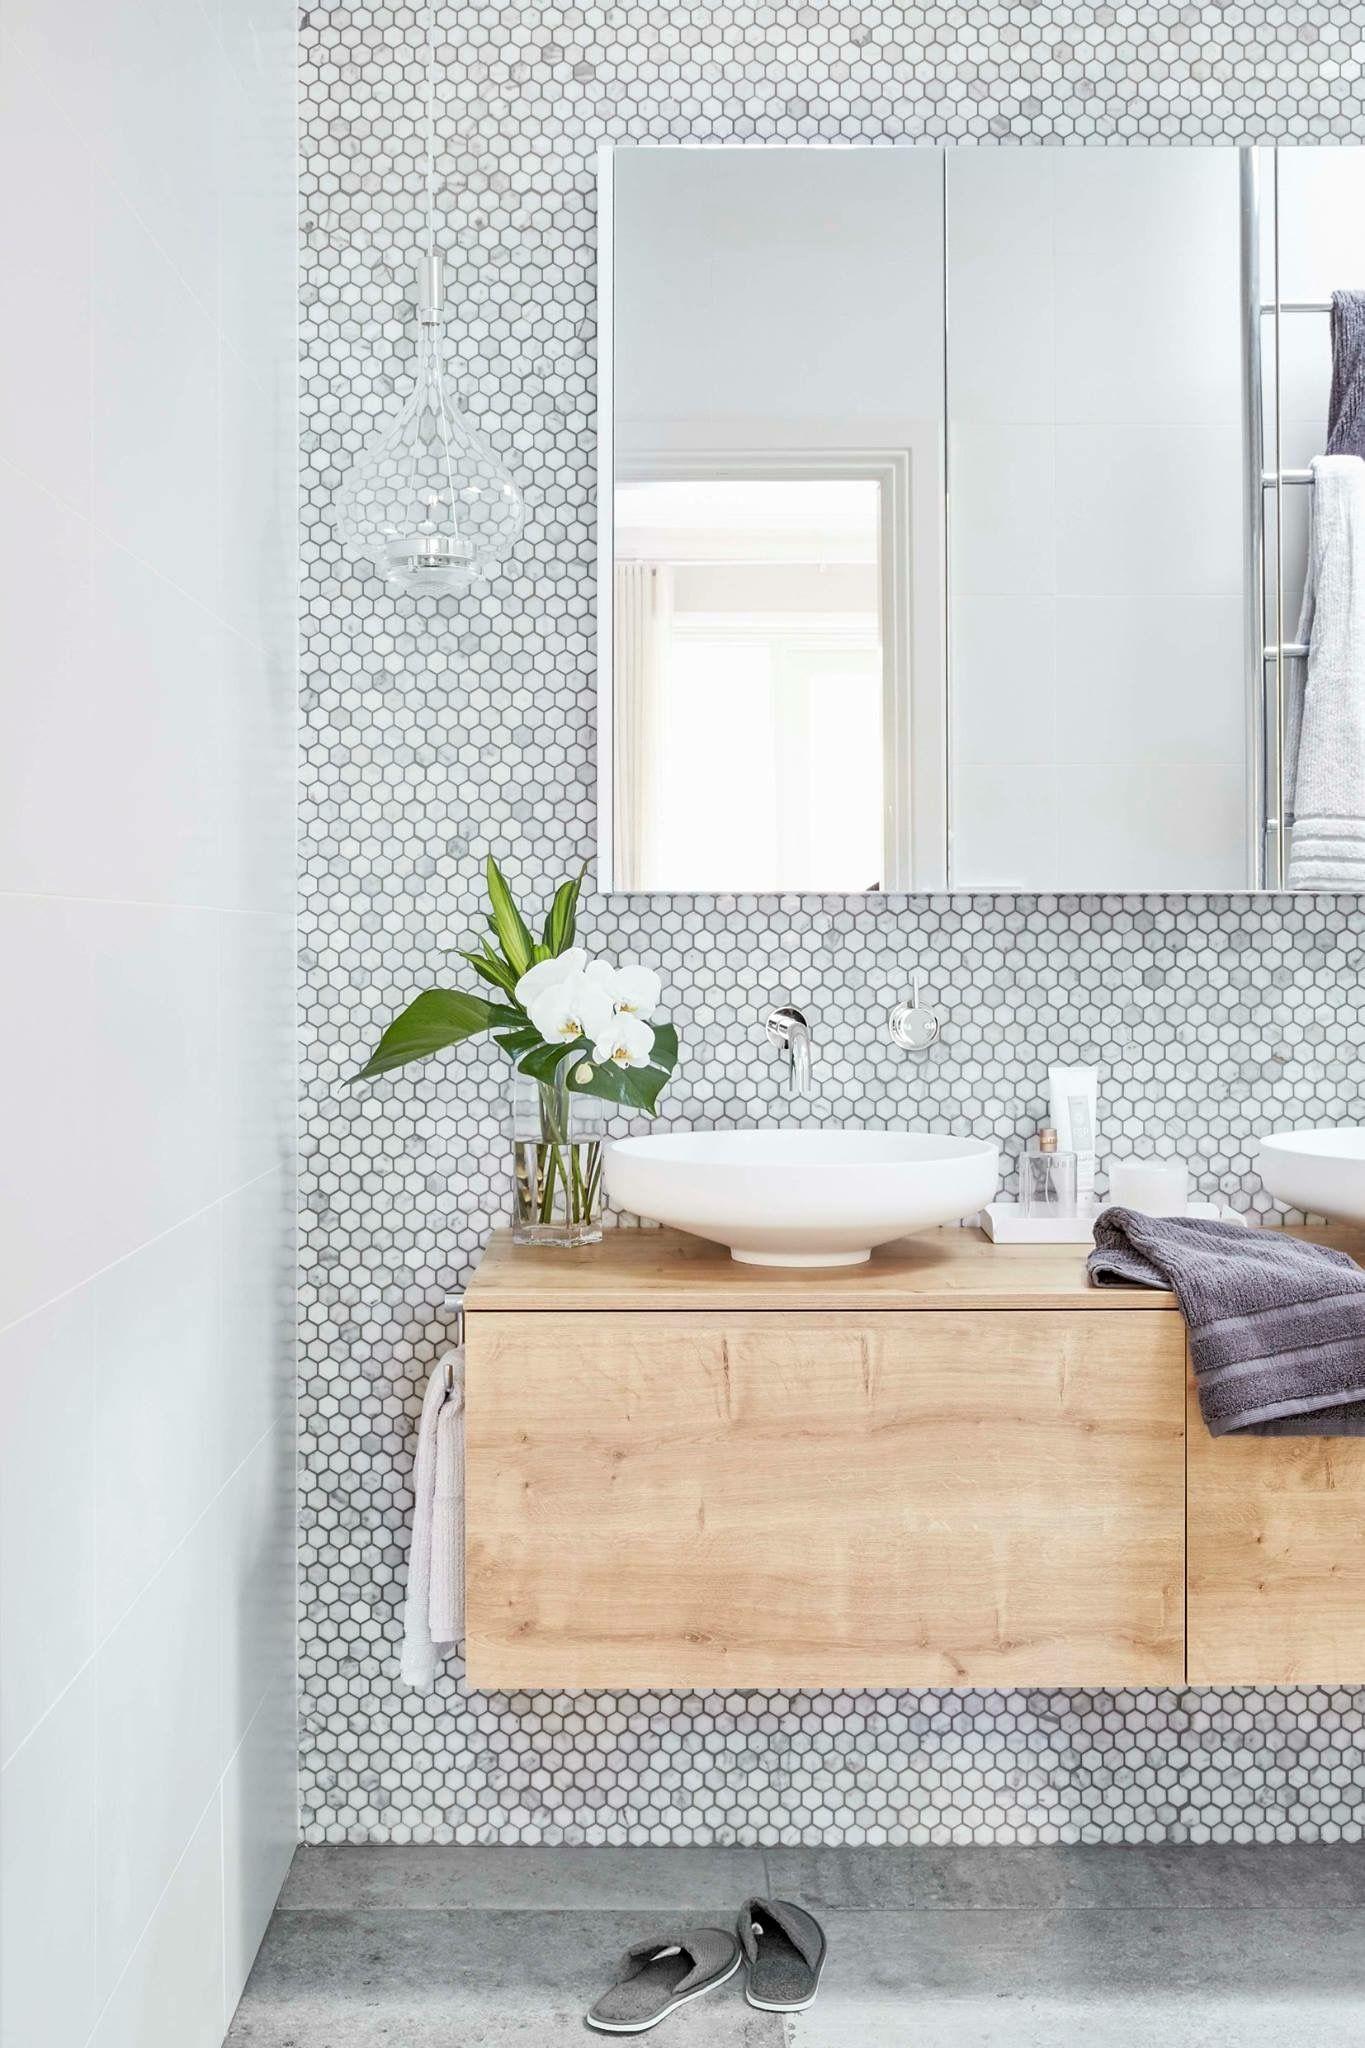 Pin By Gemma Chamberlain On Home Pinterest Toilet Future  # Idee Rangement Cd